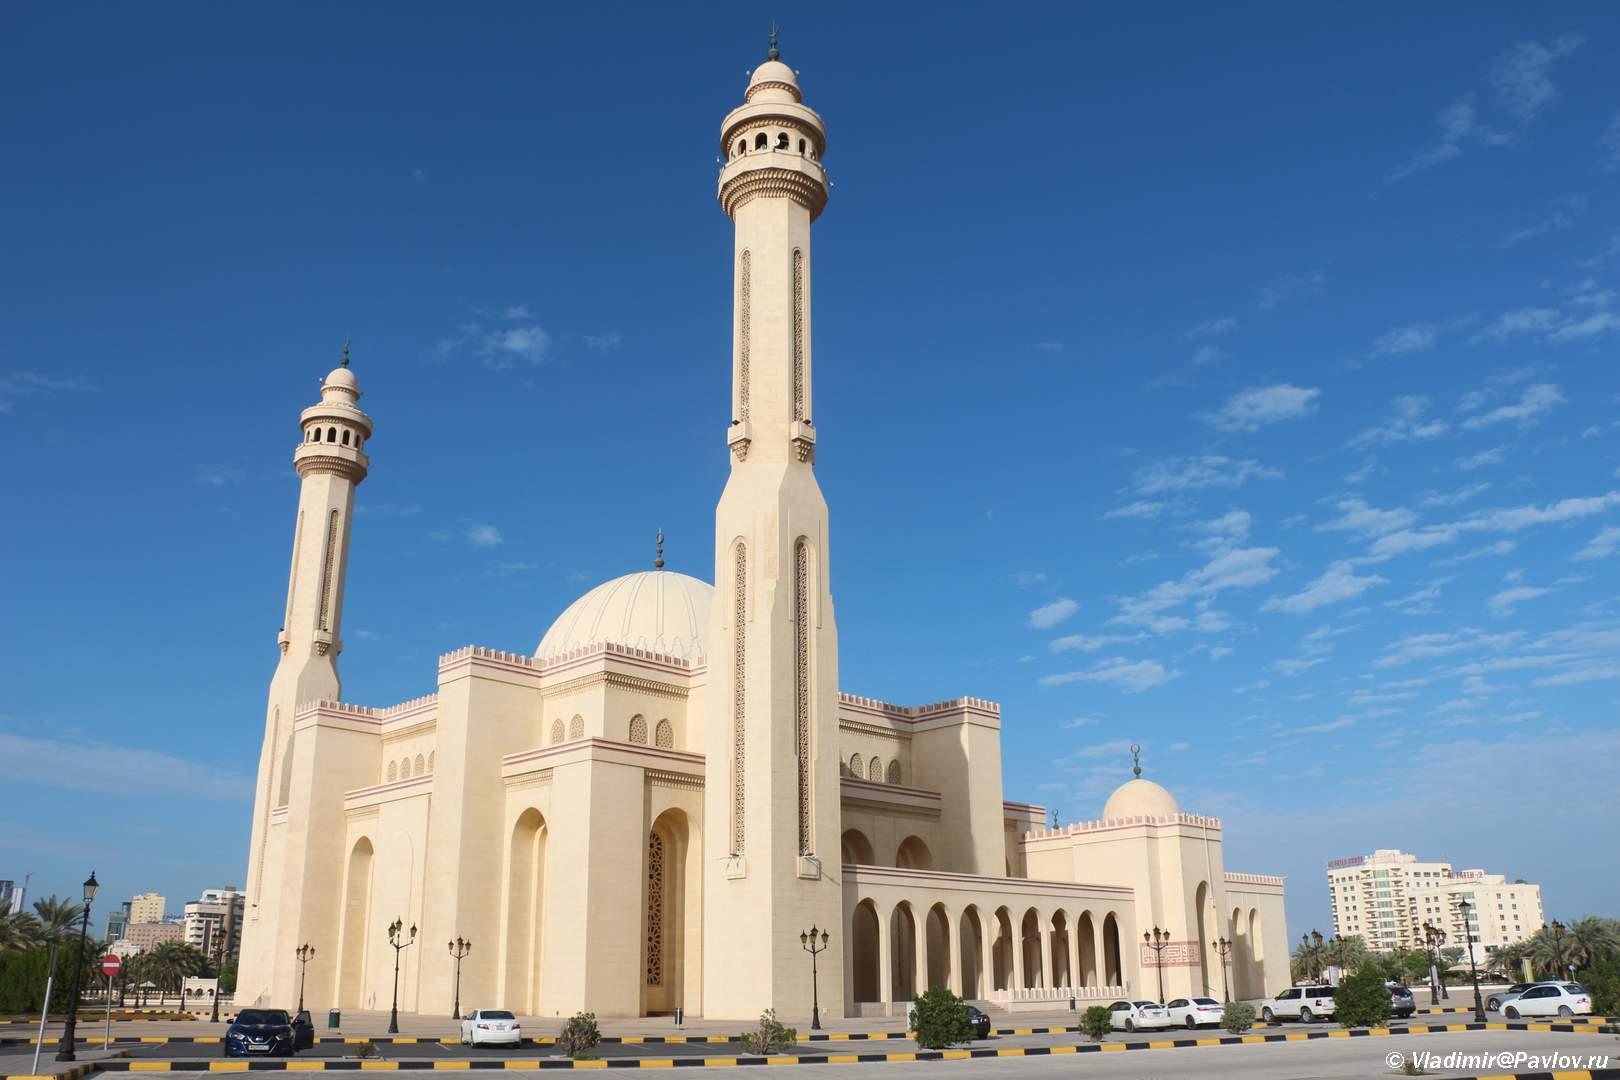 Mechet Al Fatih v Maname. Al Fatih Mosque Manama - Соборная мечеть Аль-Фатих в Манаме. Al-Fatih Mosque / Great Mosque